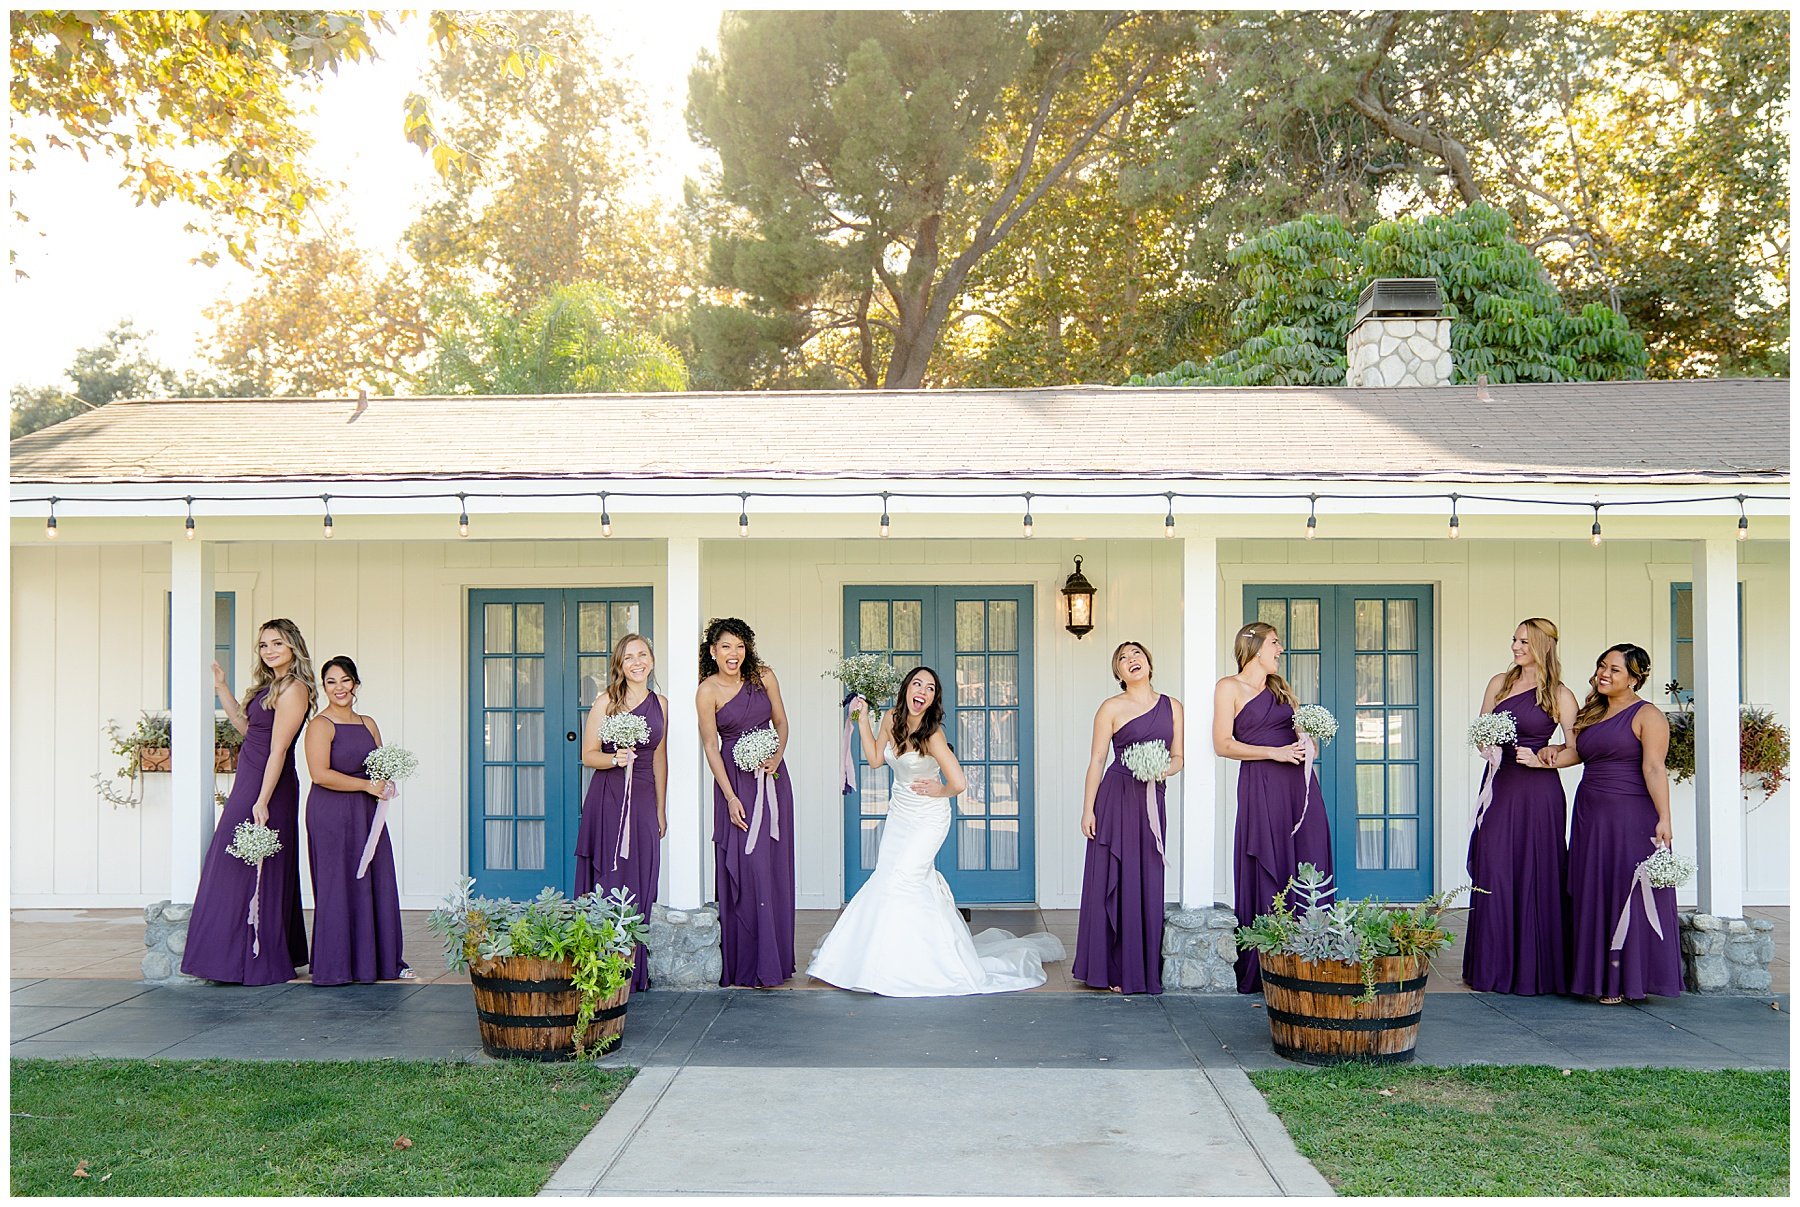 calamigos equestrian center wedding bridal party